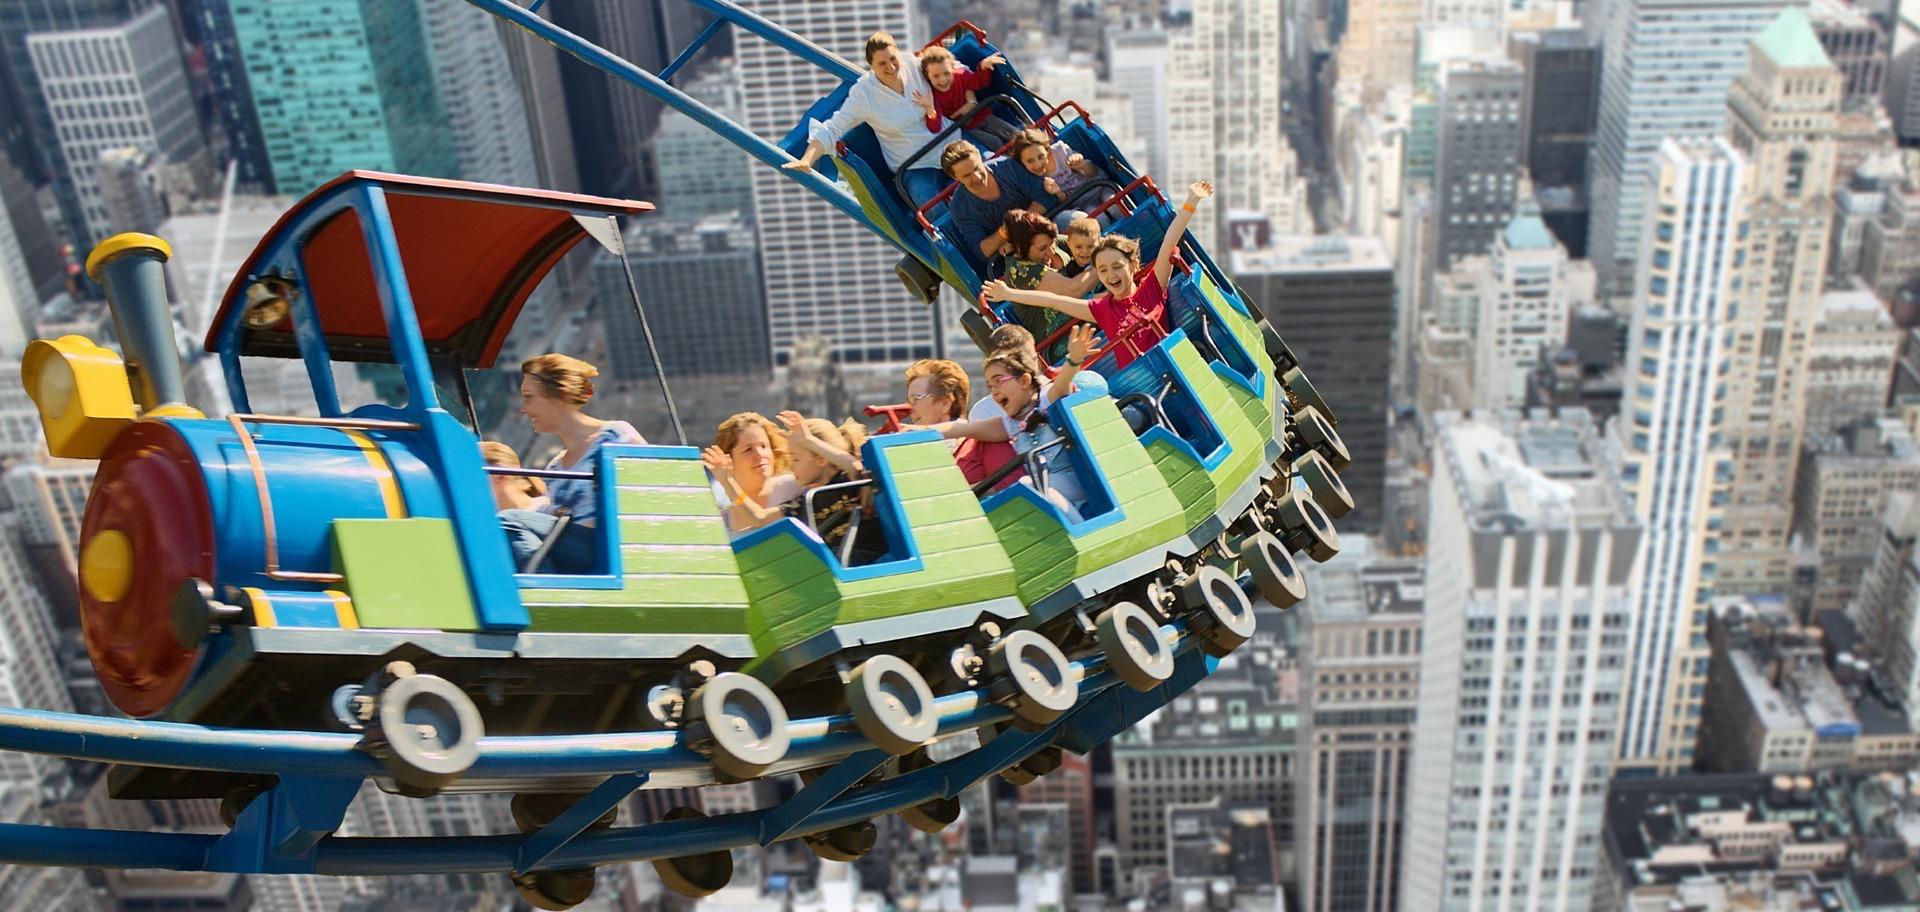 Dangerous roller coaster